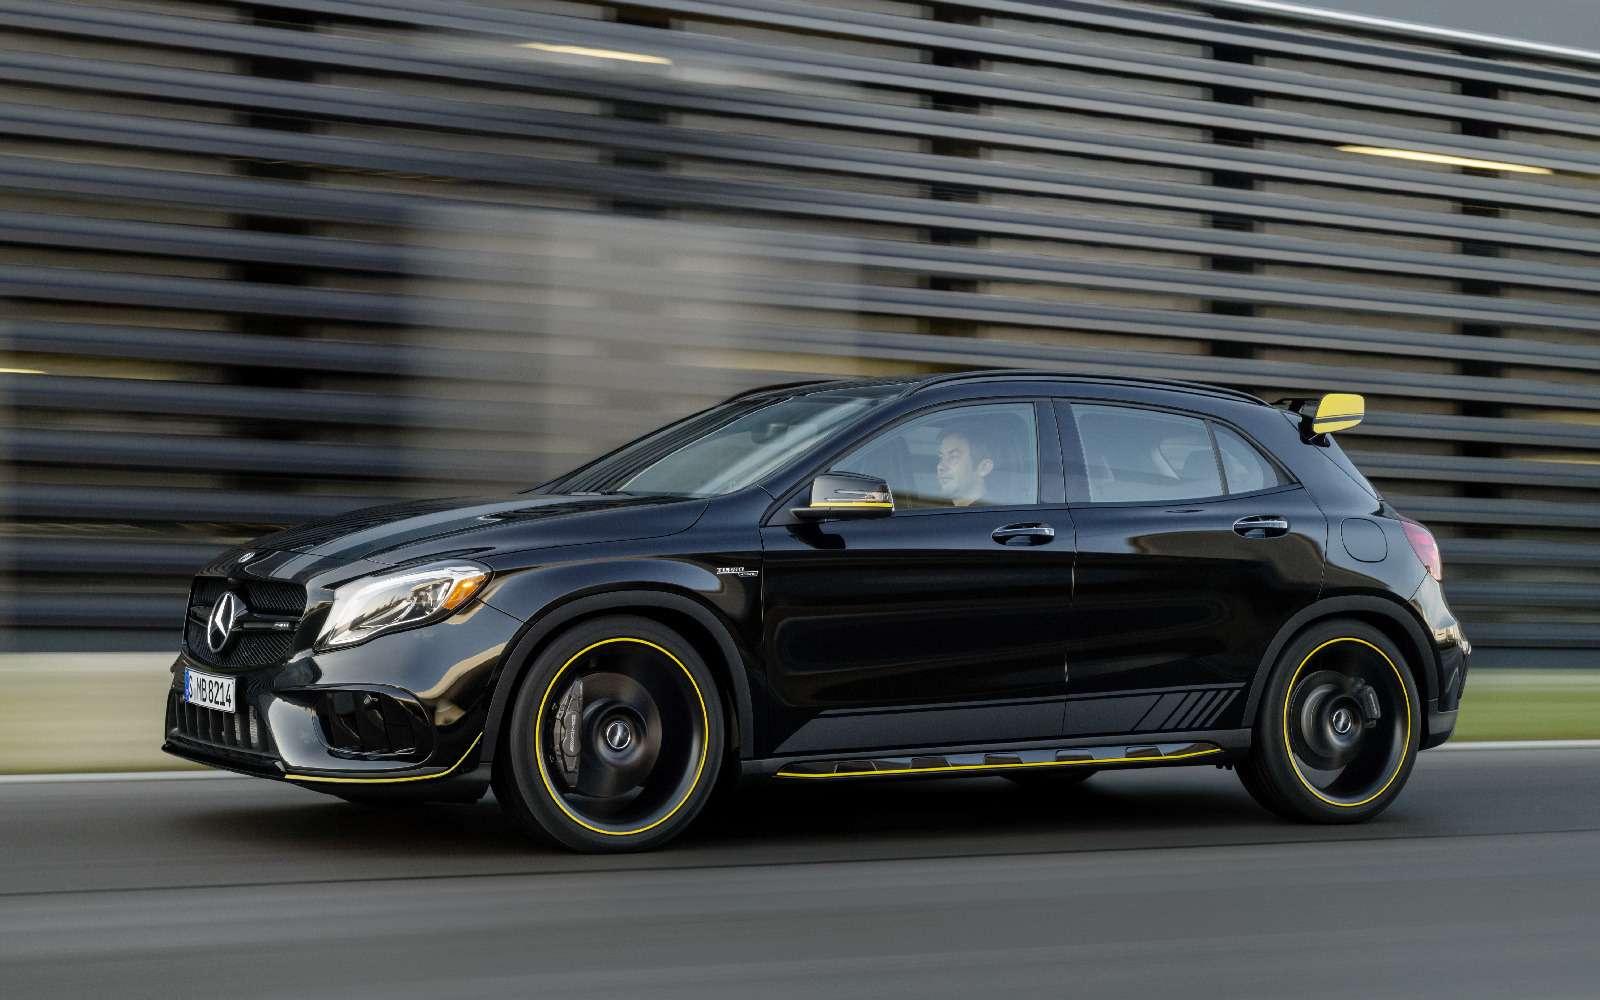 Mercedes-Benz GLA стал краше, нонепросторнее— фото 690086